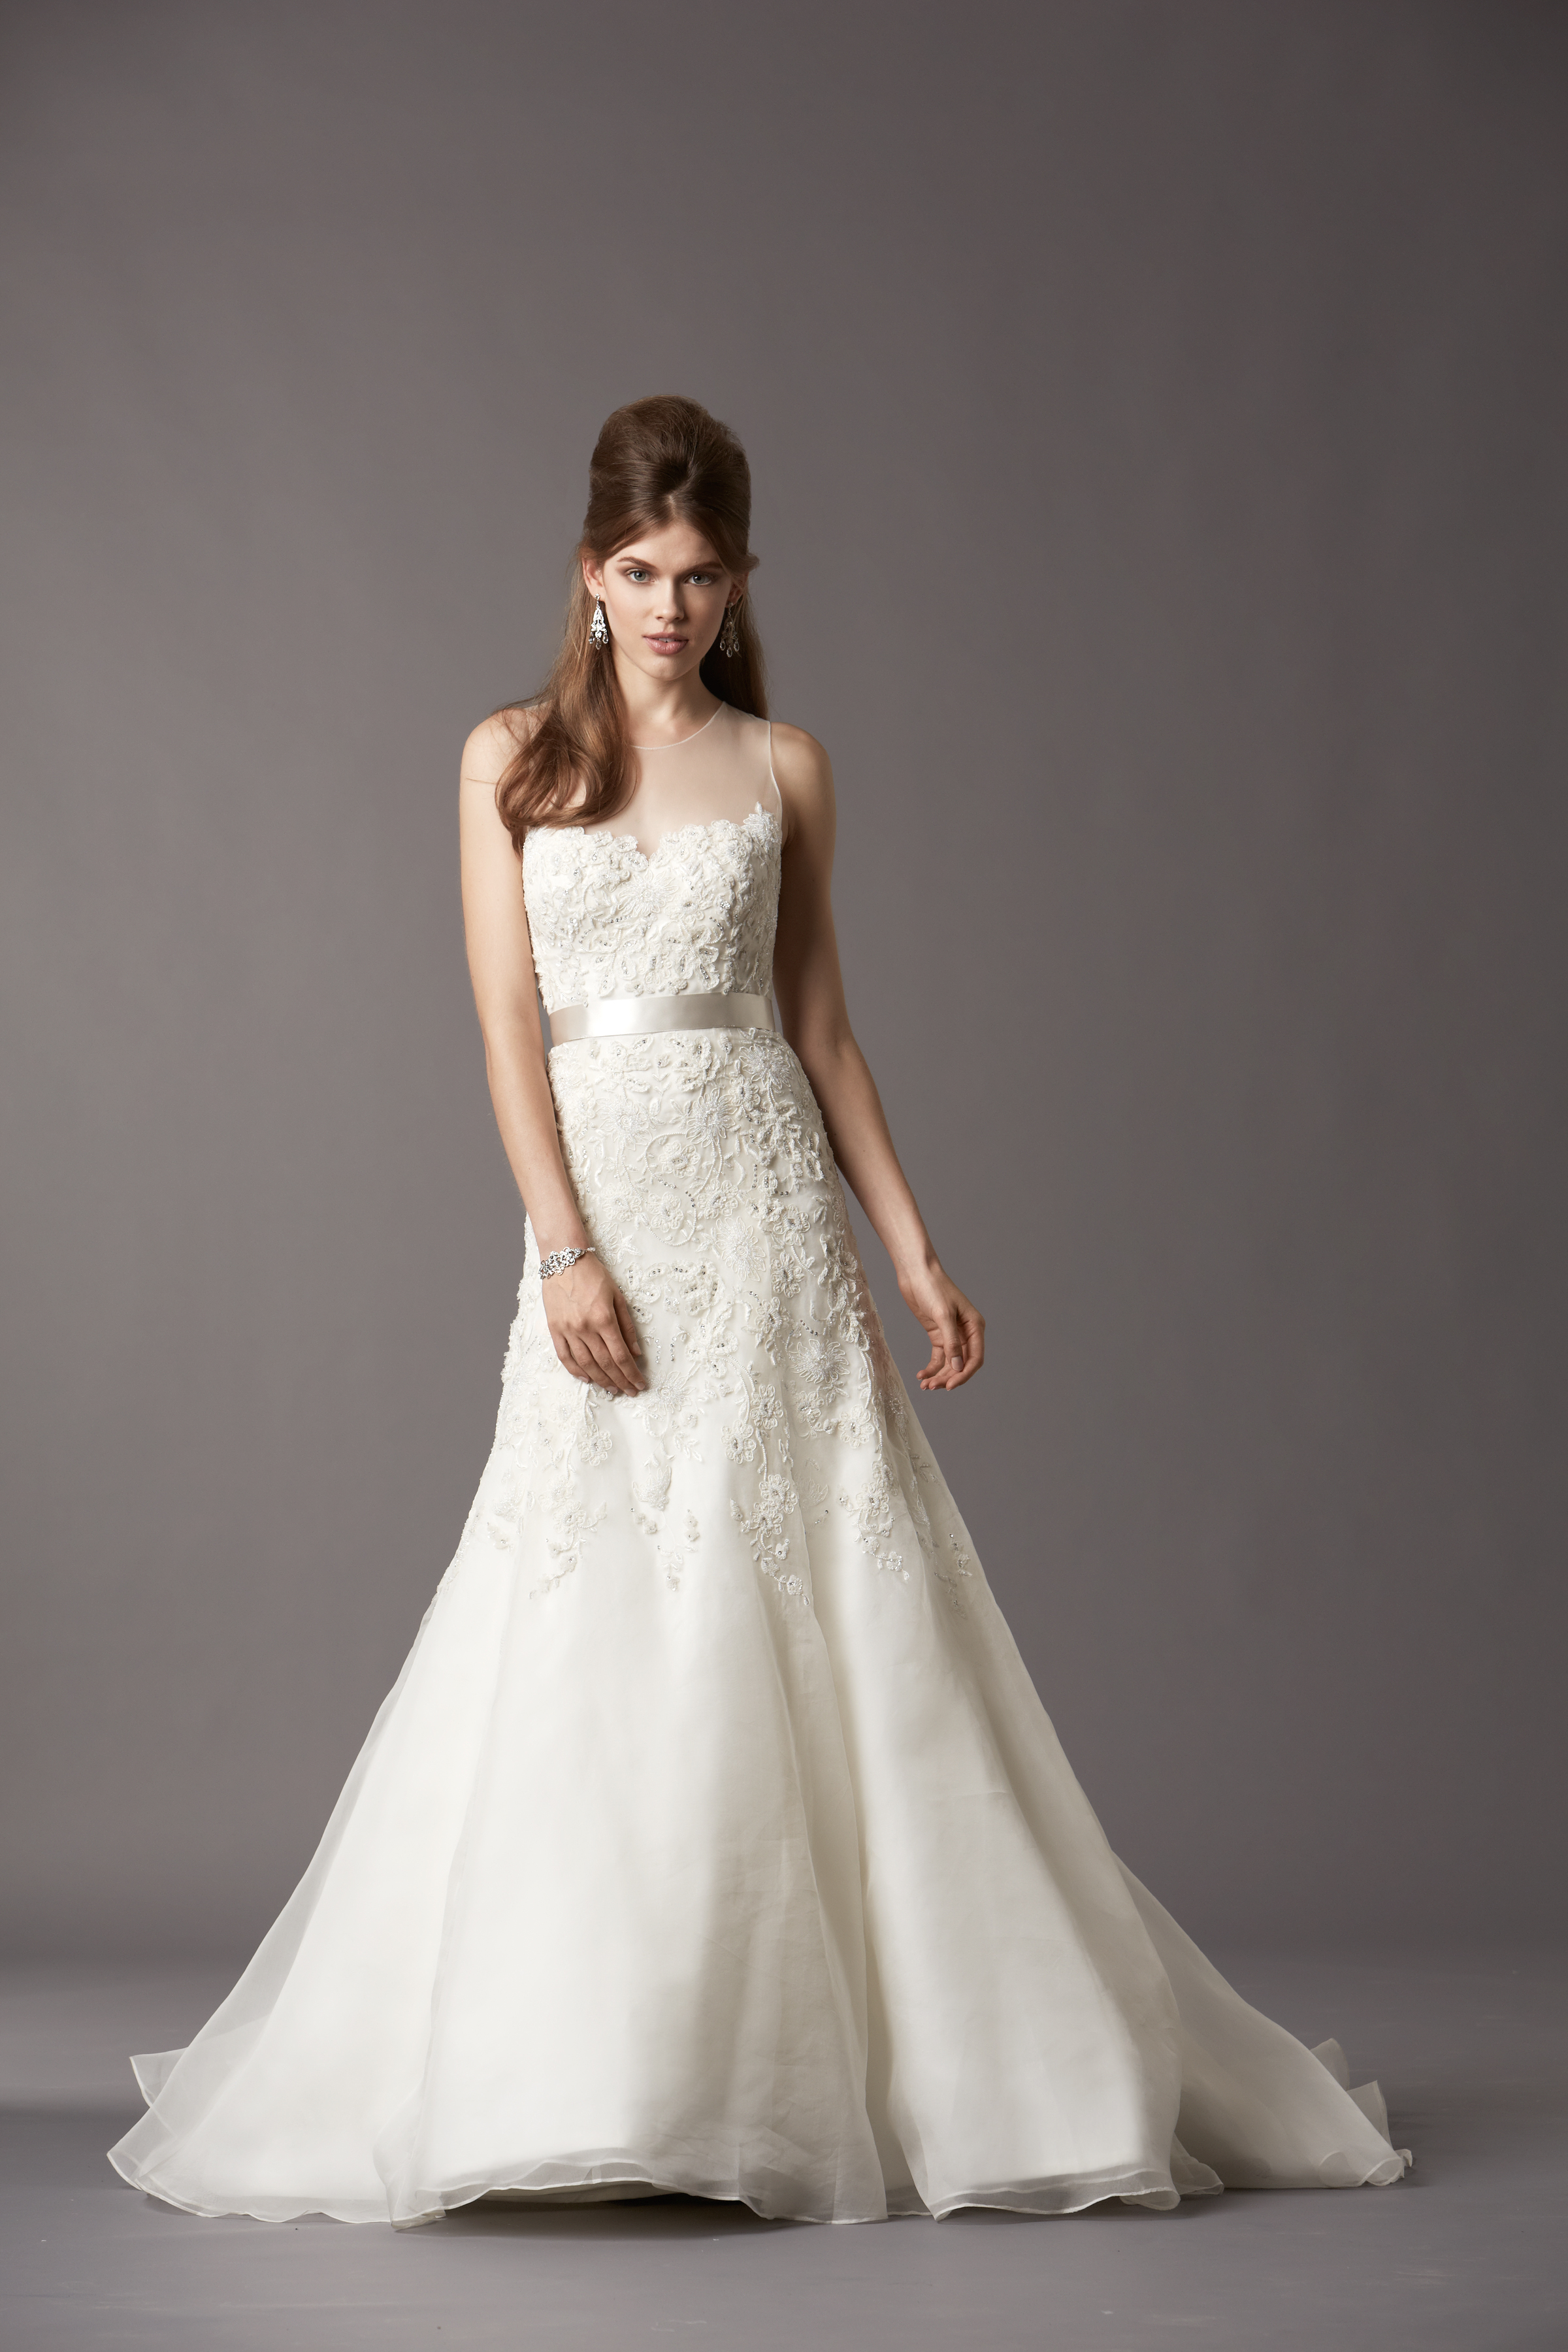 Watters bridal gowns fall 2013 wedding dress 4071b for Watters wtoo wedding dresses